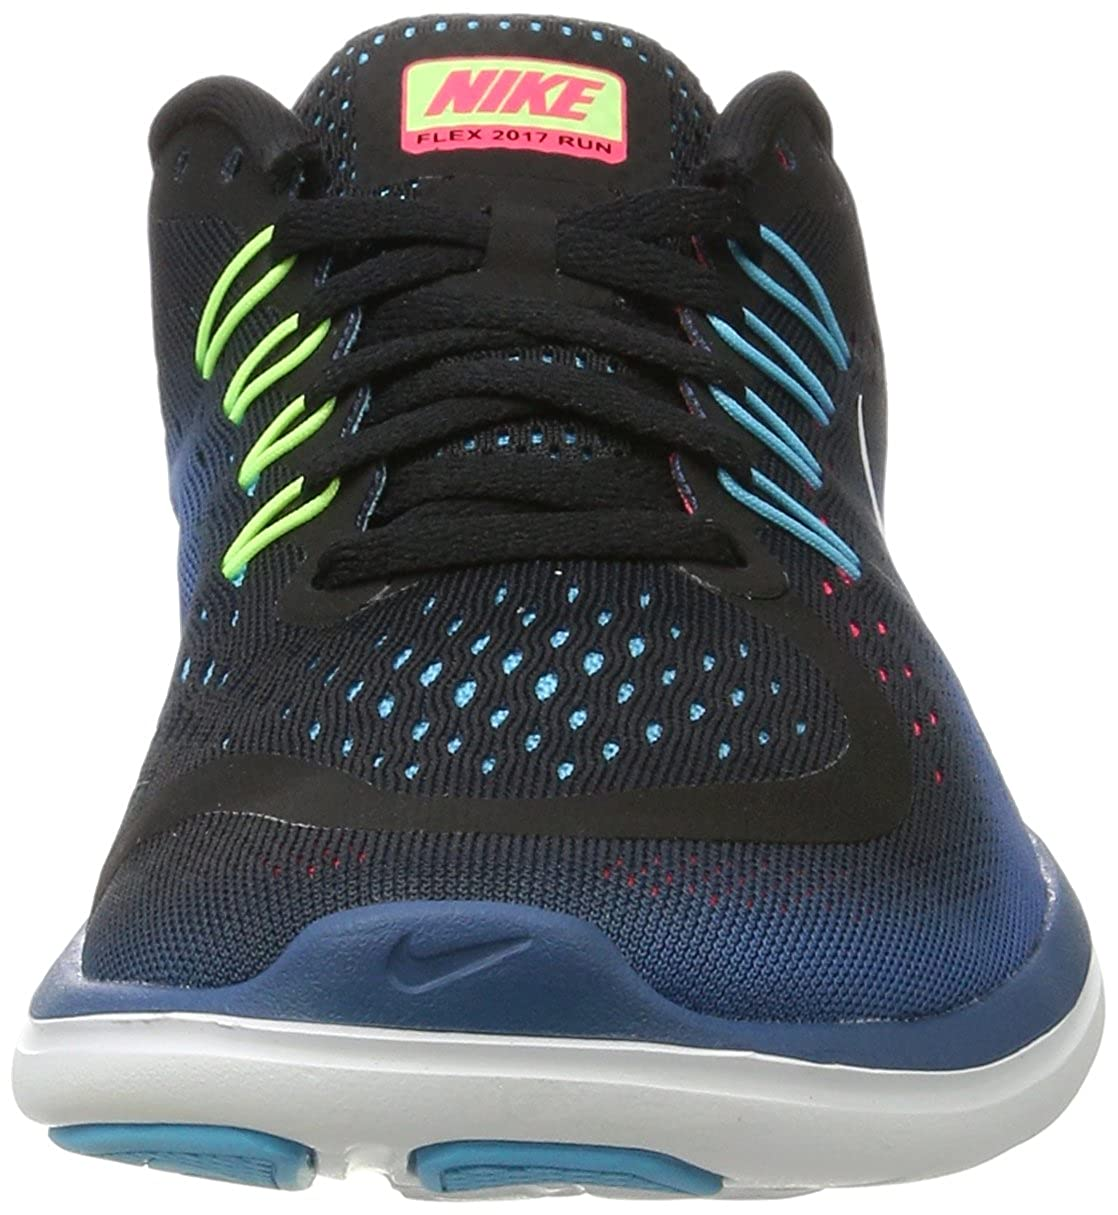 Sense Free Shoe Rn Women's Nike Running iTZwPXkOul